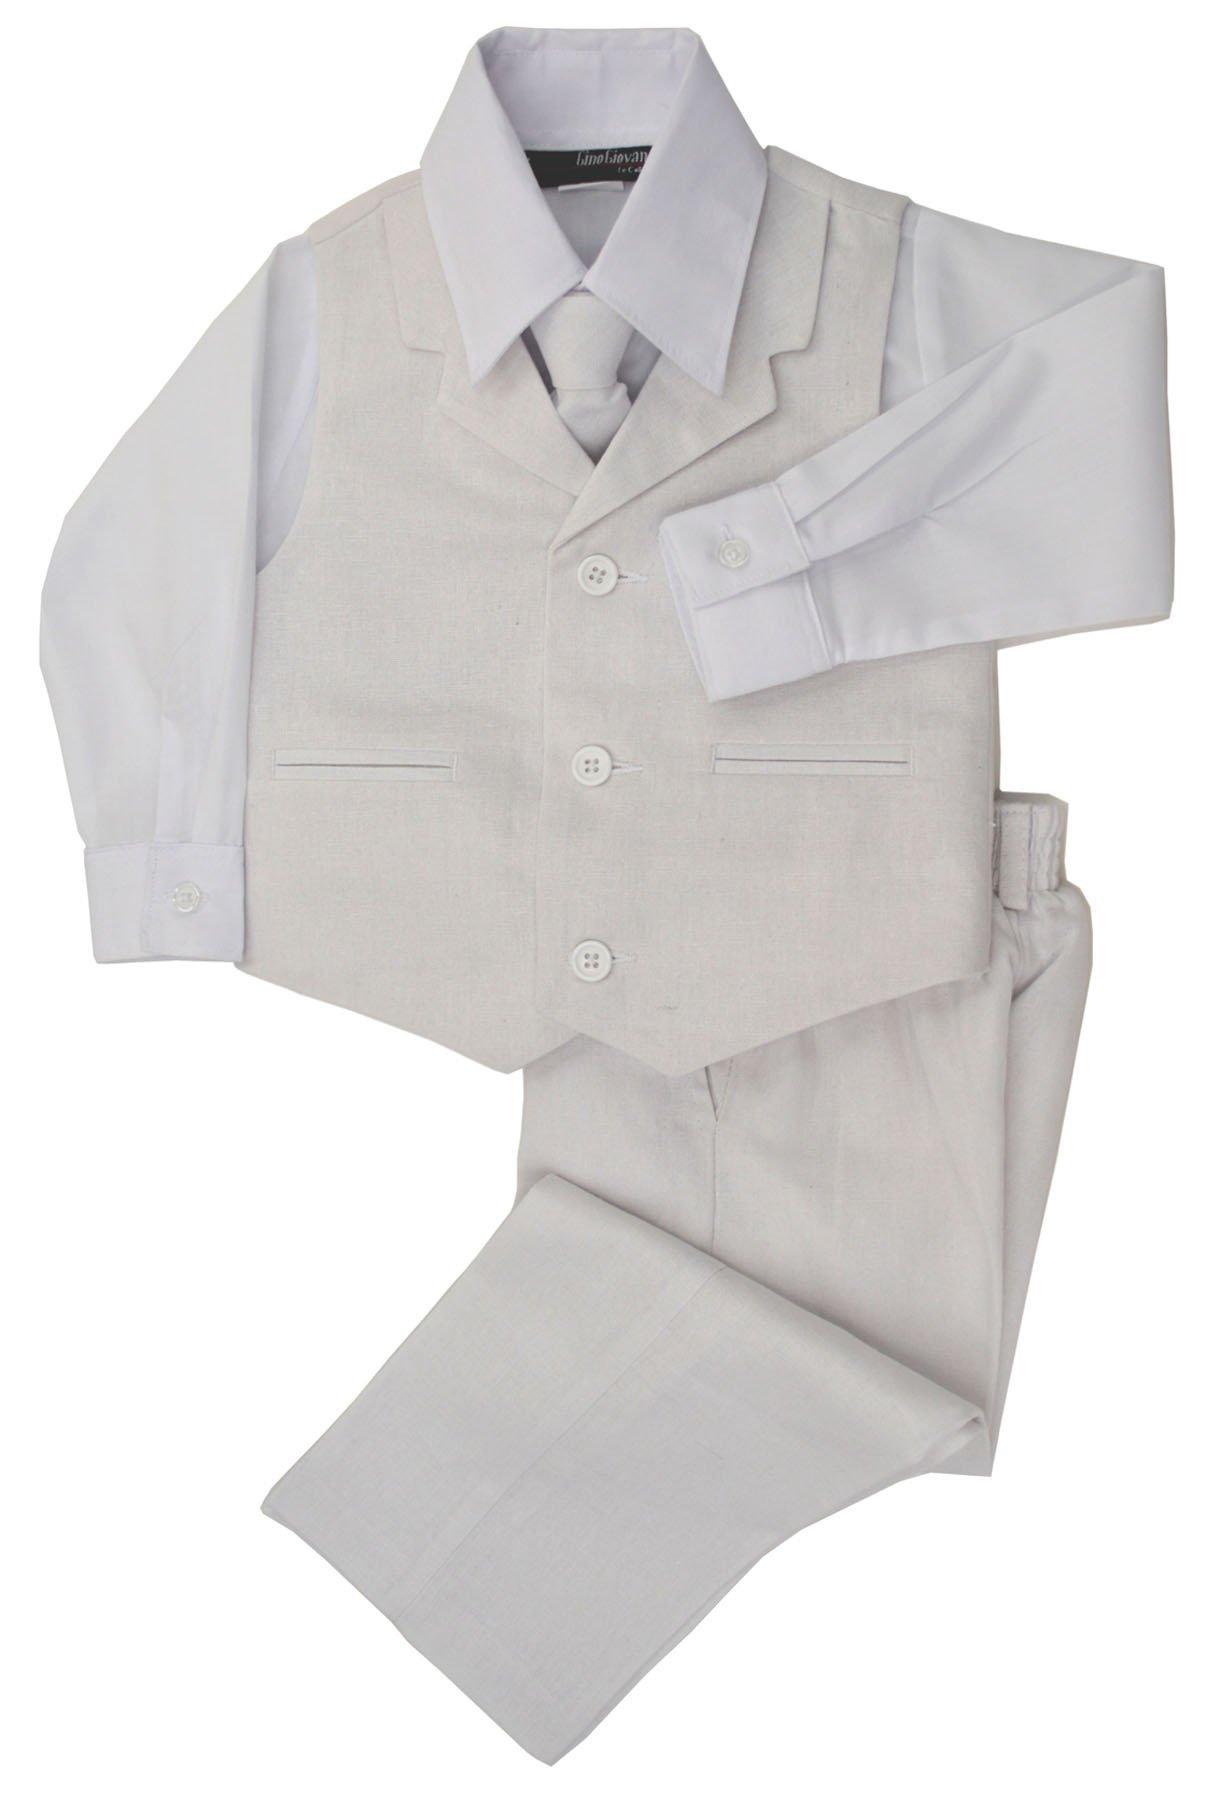 G270 Boys Summer Linen Blend Suit Vest Dresswear Set (3T, White)